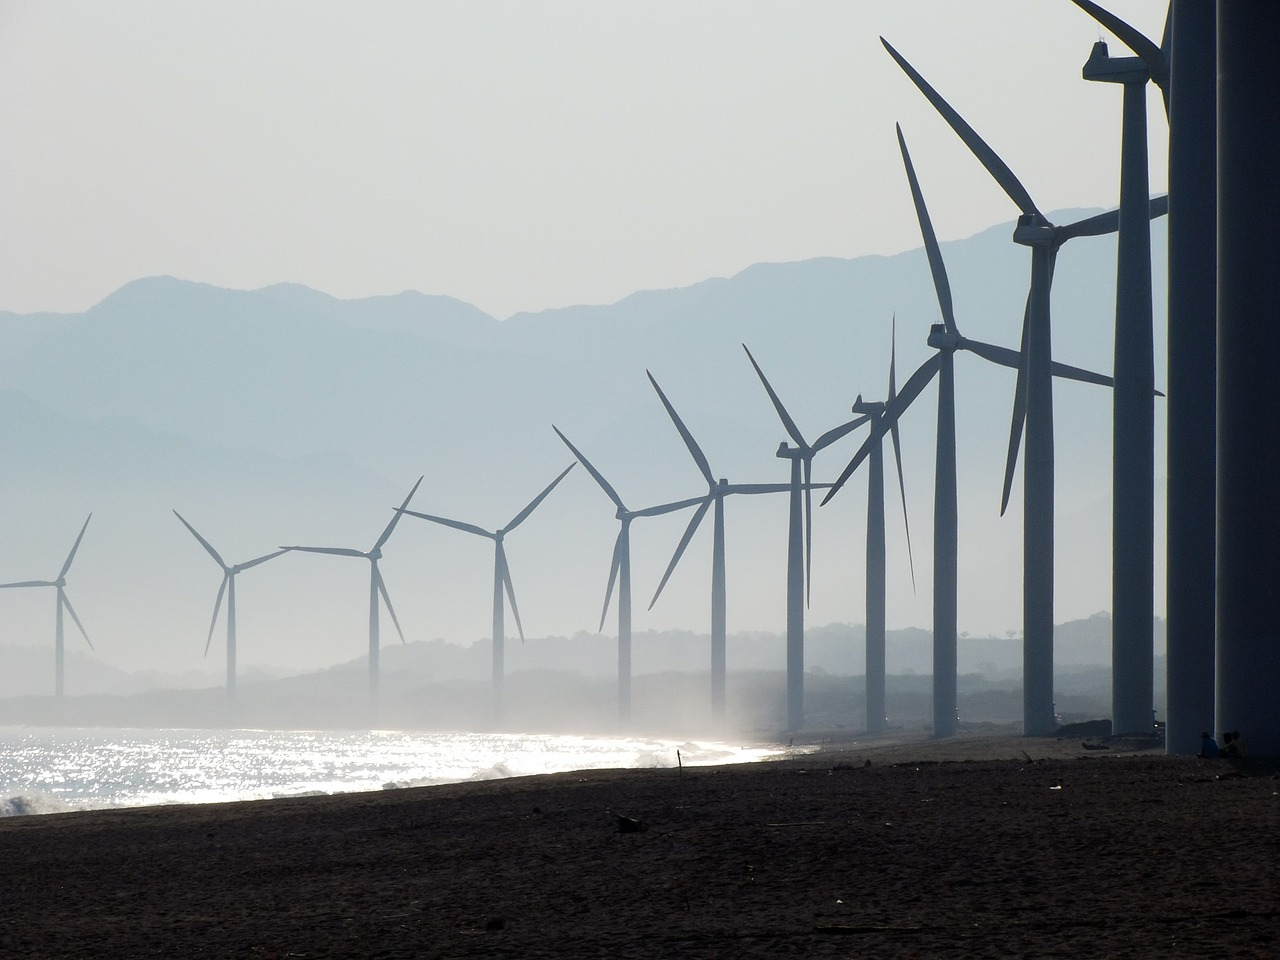 A coastal wind farm